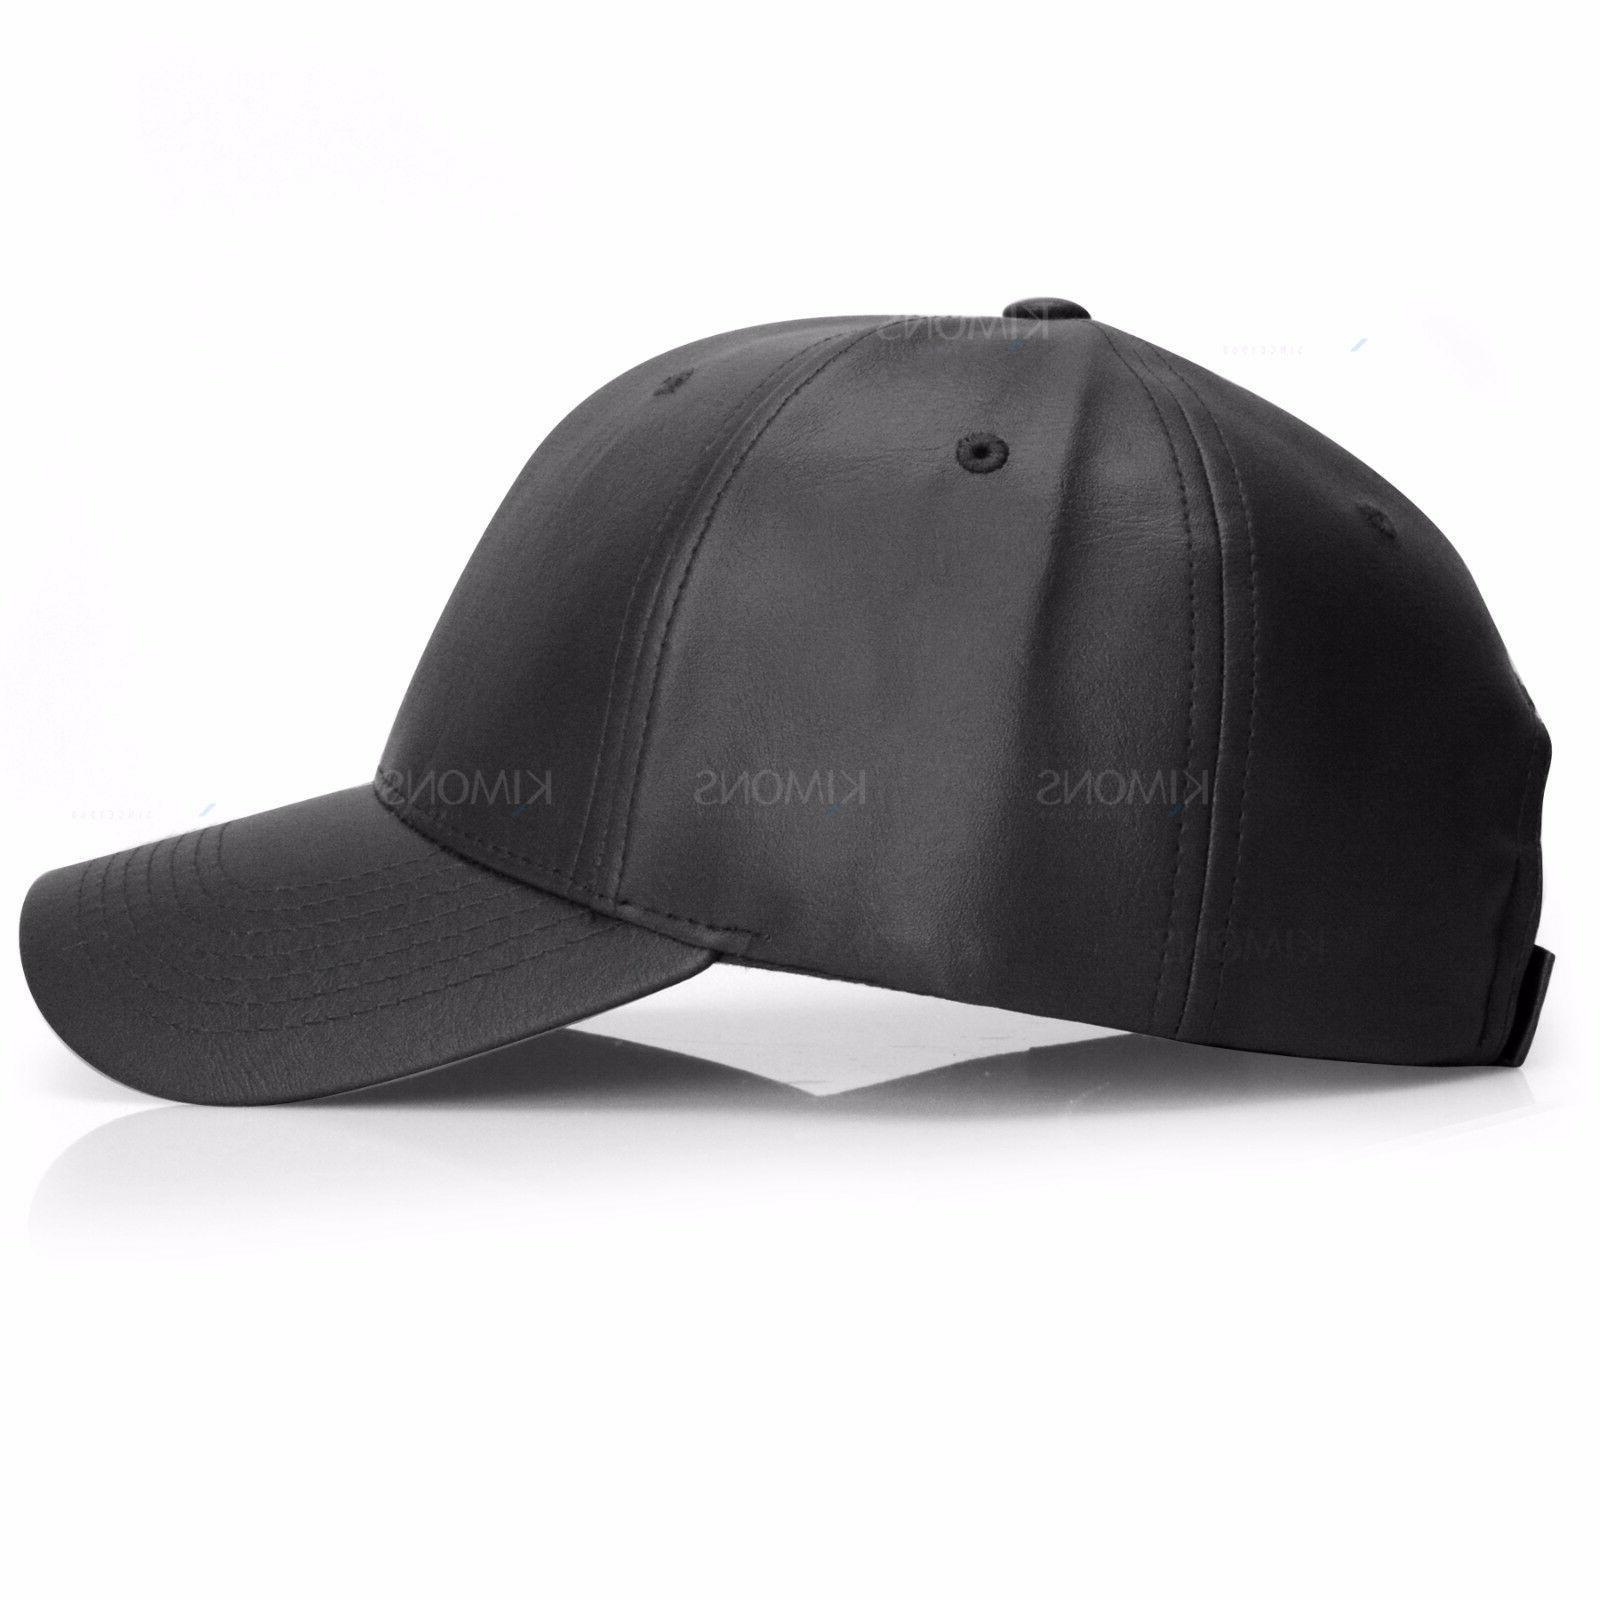 V-Adjustable Unisex Trucker Cap Plain Hat